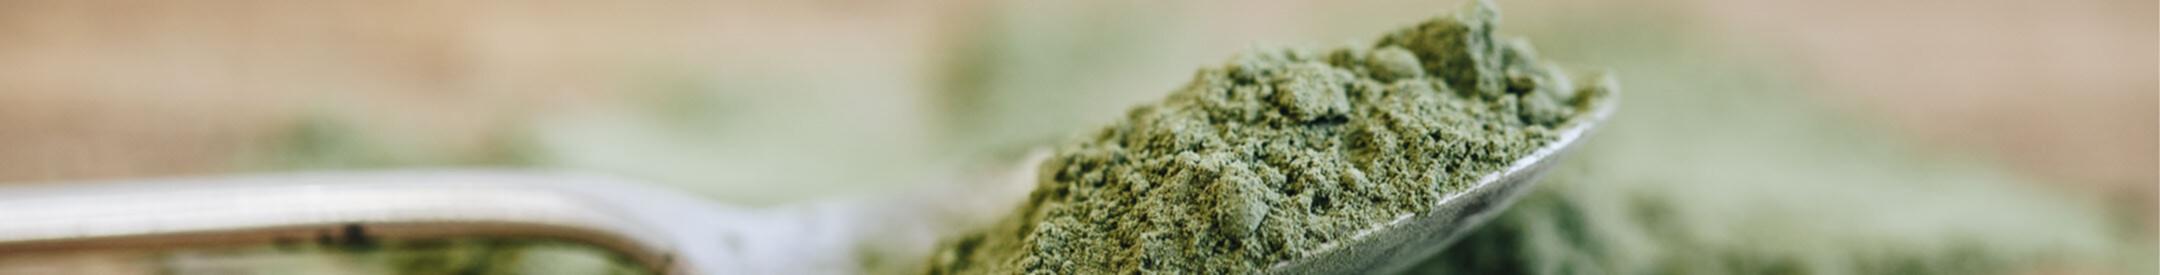 green tea matcha and matcha powder